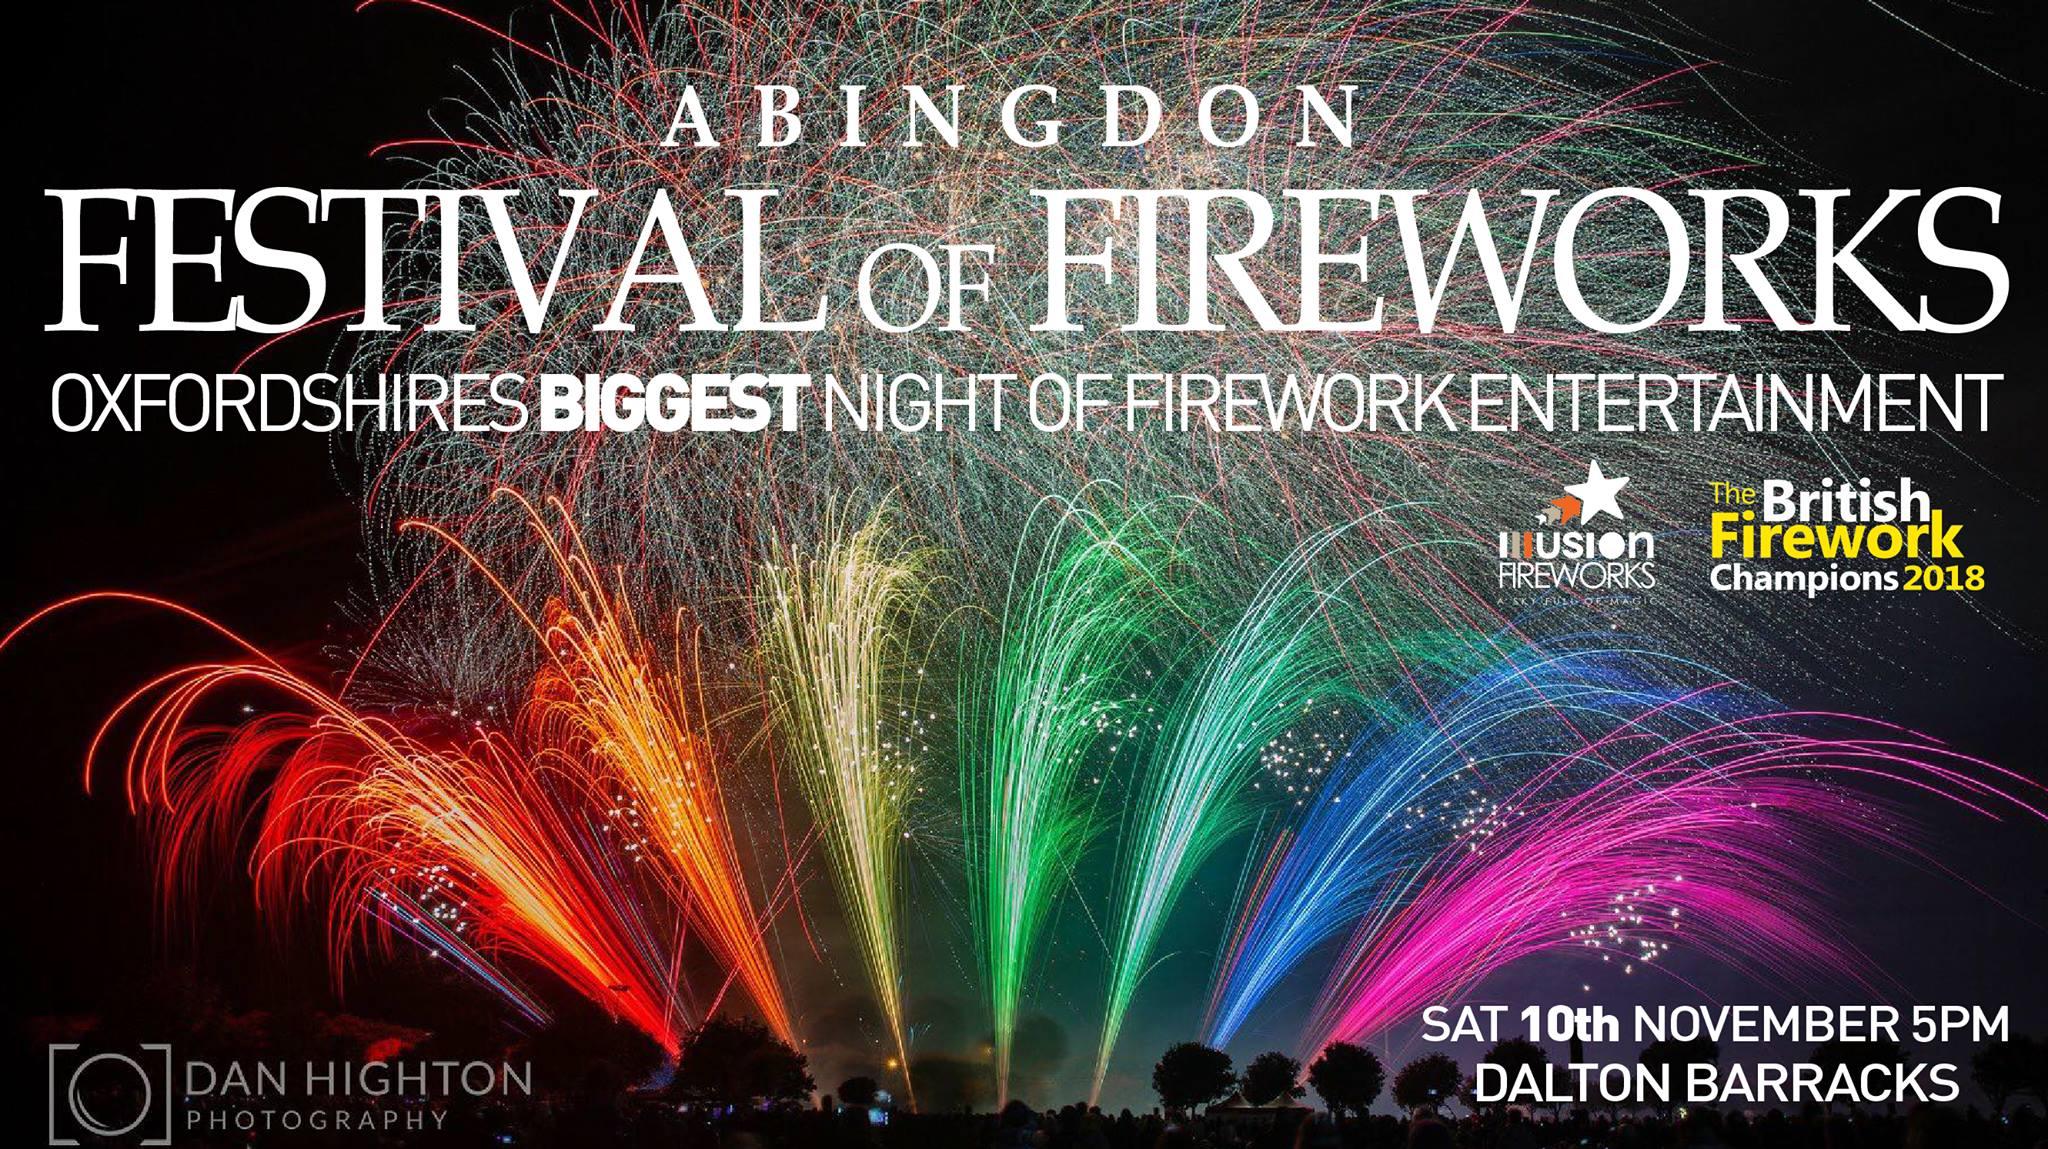 Abingdon fireworks 2018